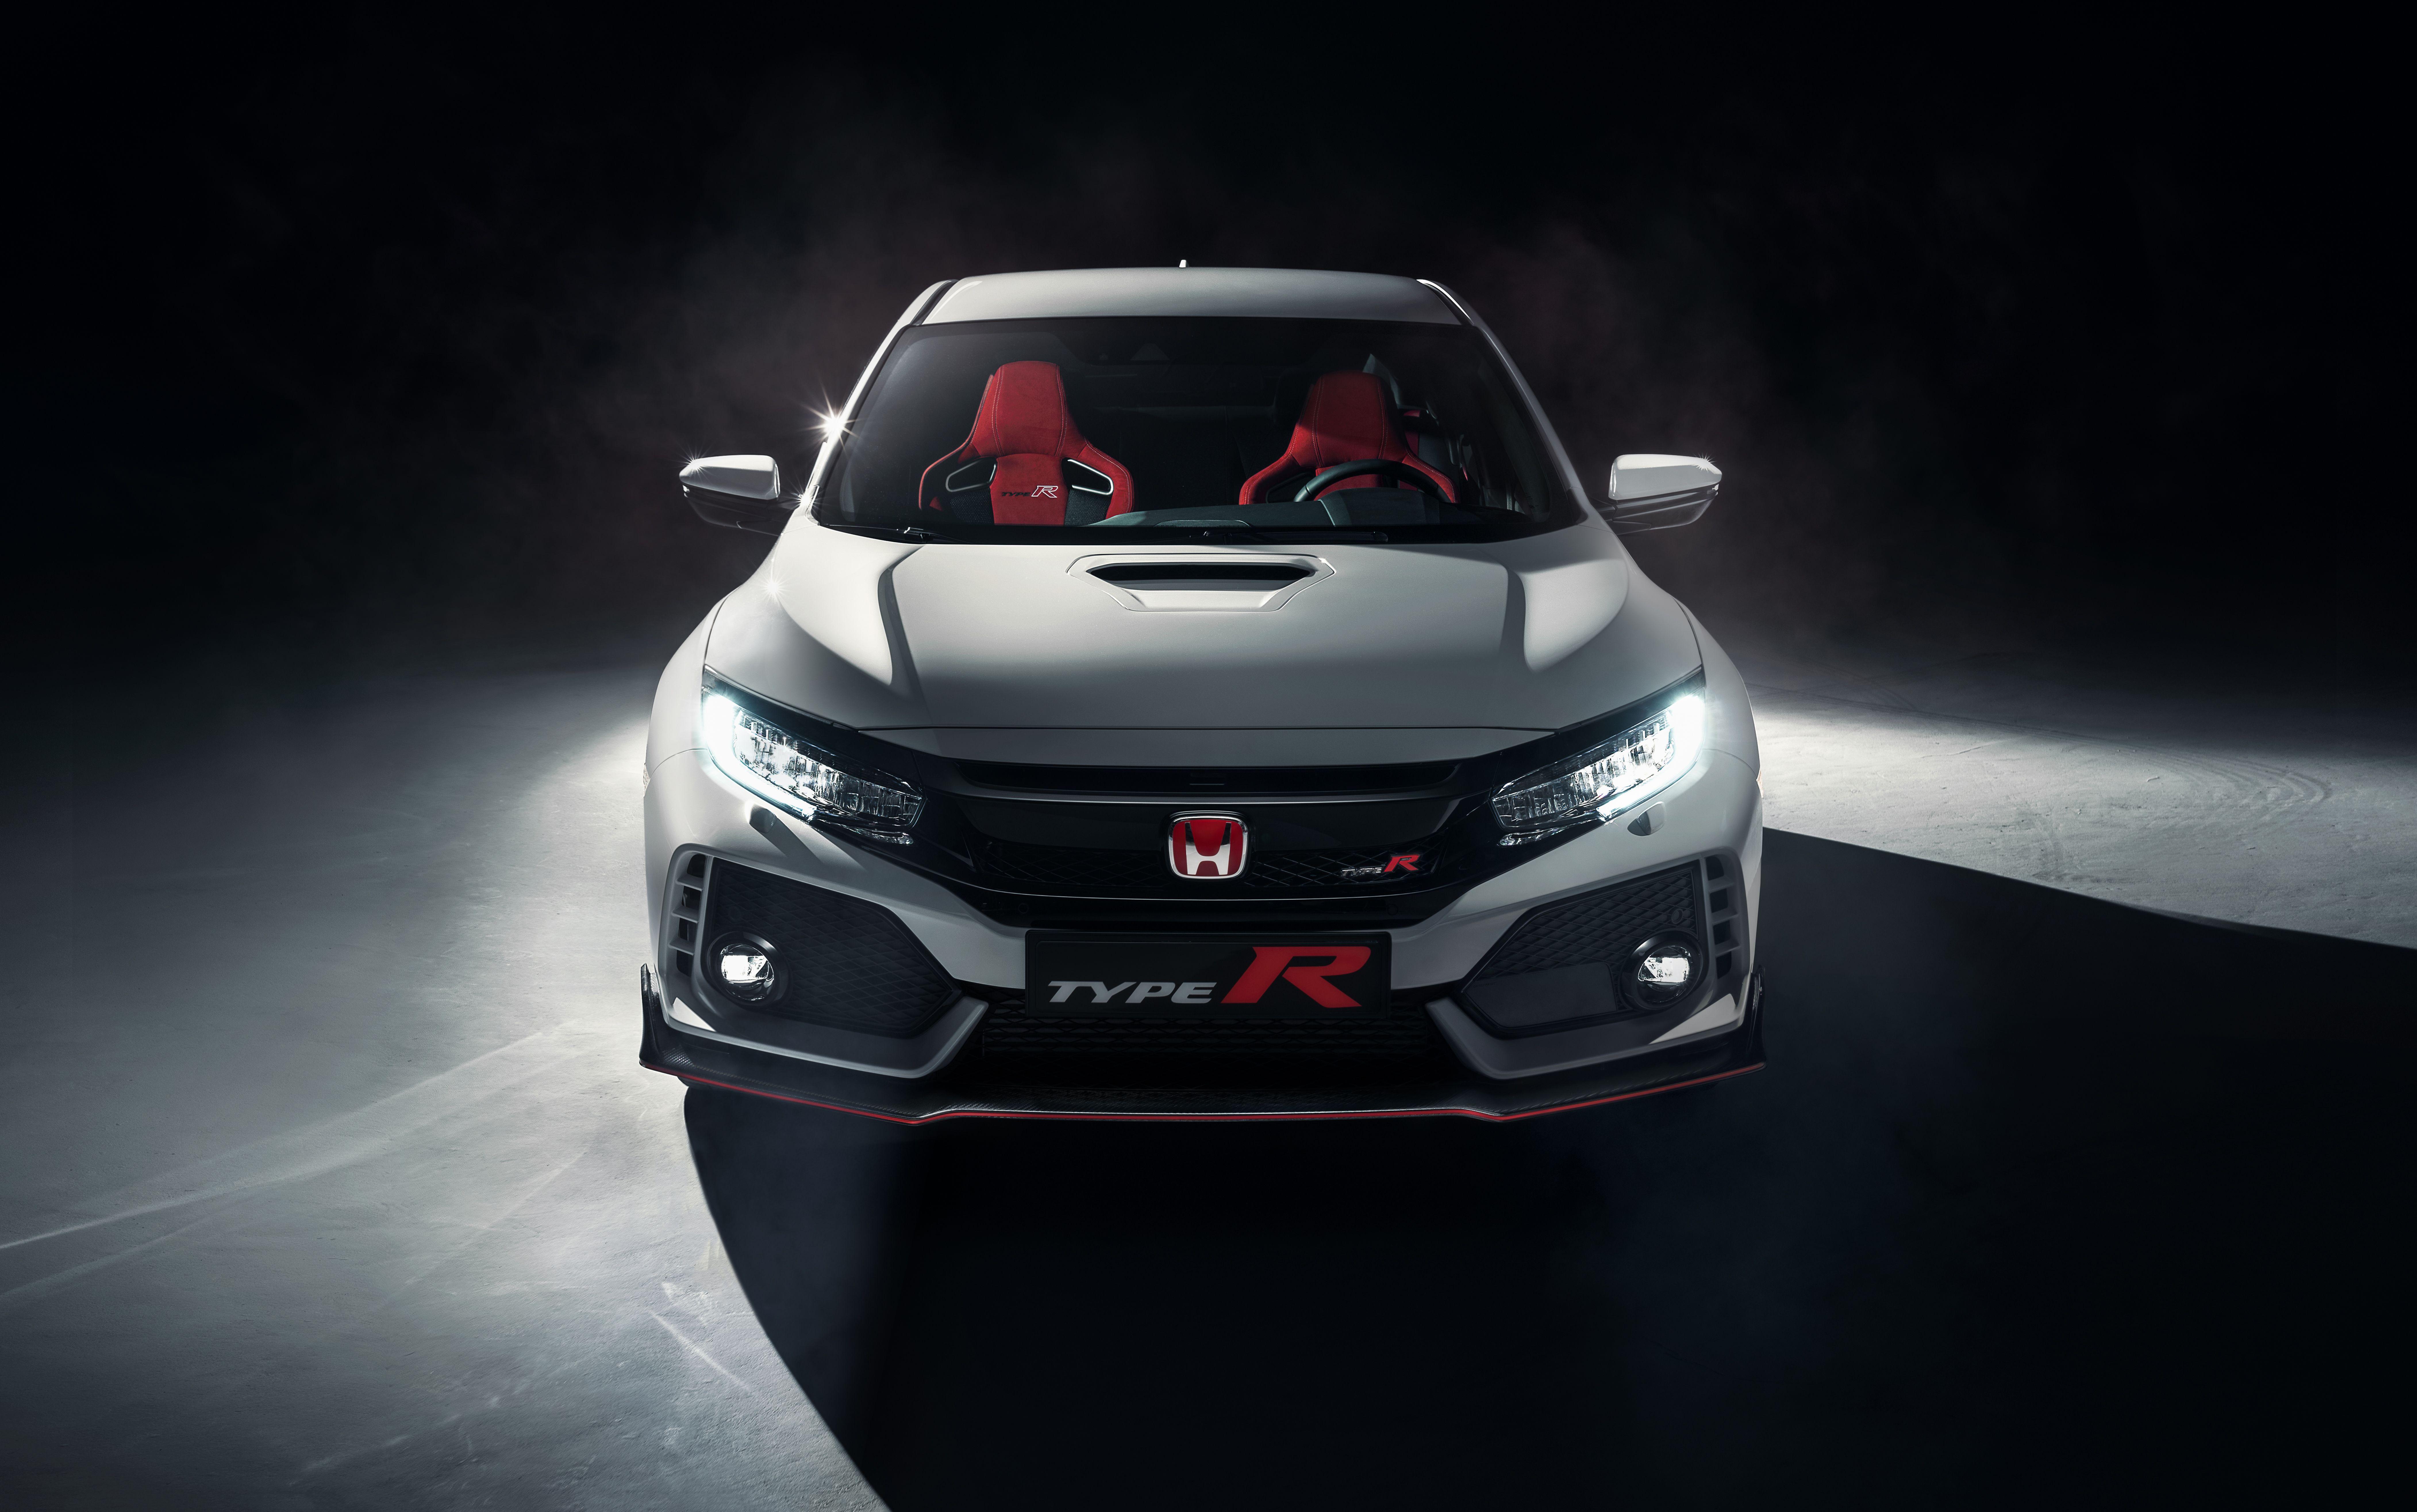 The 2018 Honda Civic Type R Is 306 Hp Of Front Wheel Drive Fury Coming To America Honda Civic Type R Honda Civic Civic